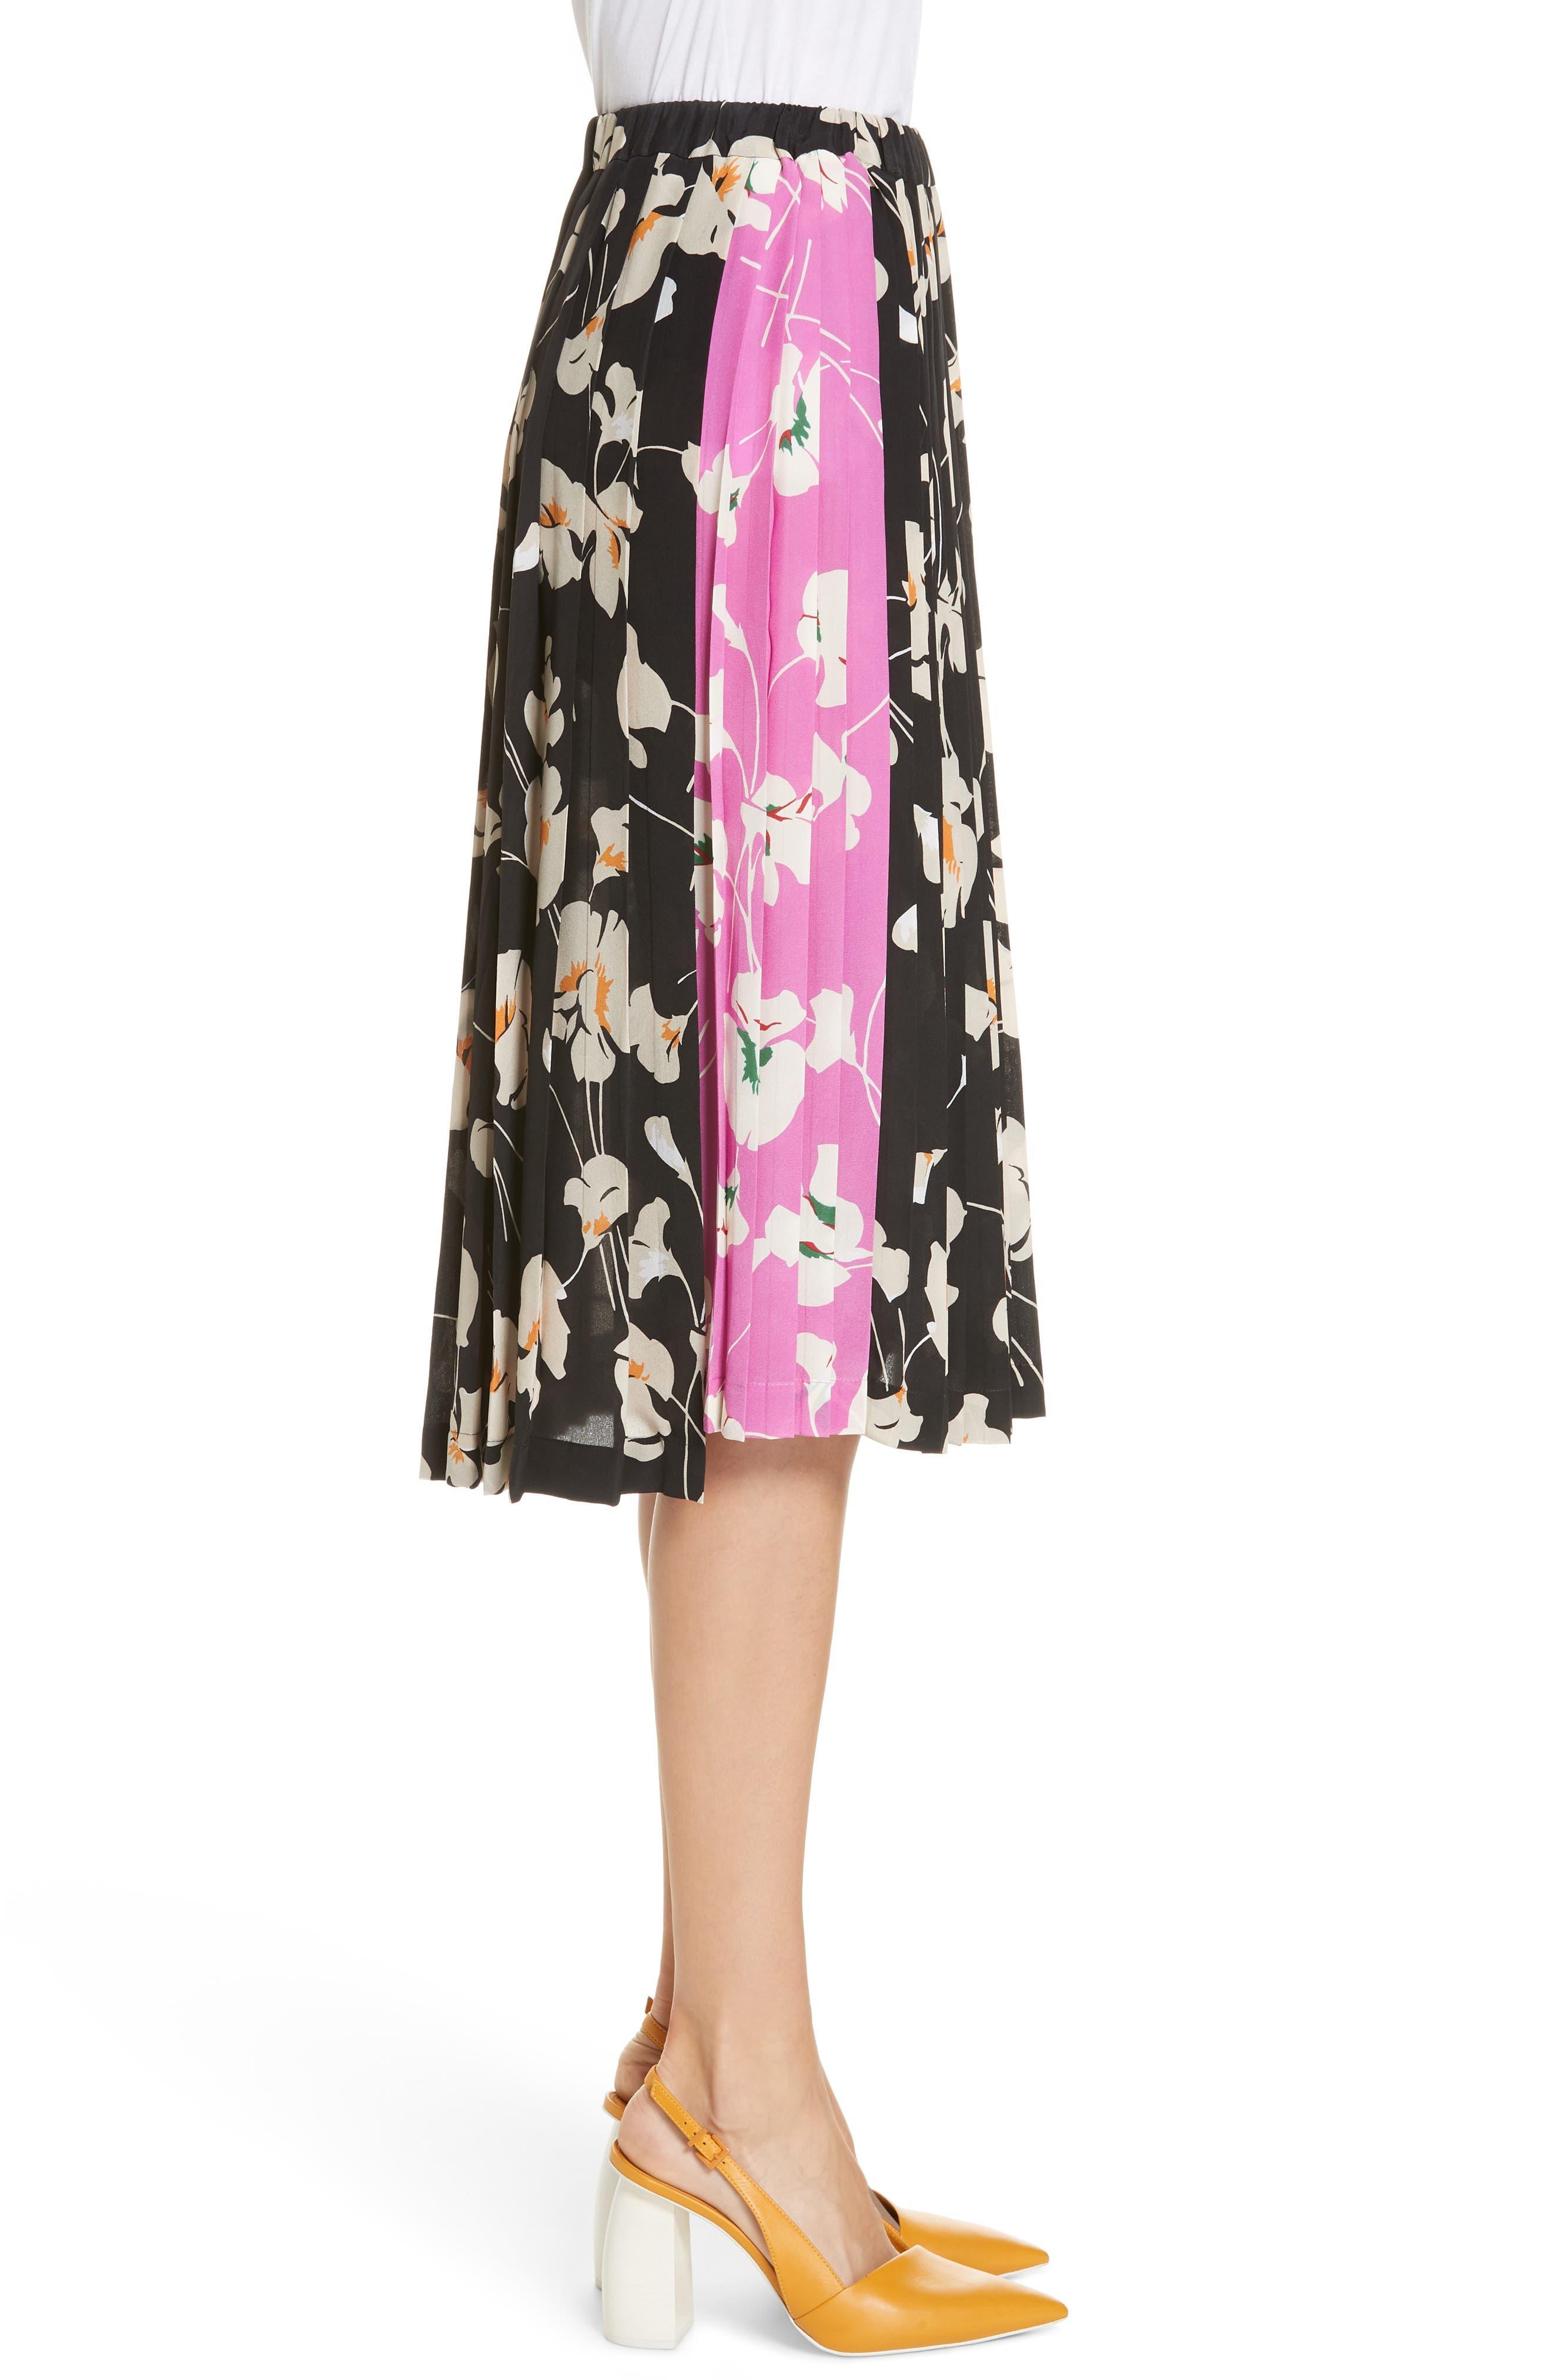 N°21,                             Nº21 Contrast Panel Floral Print Silk Skirt,                             Alternate thumbnail 3, color,                             STAMPA FONDO NERO